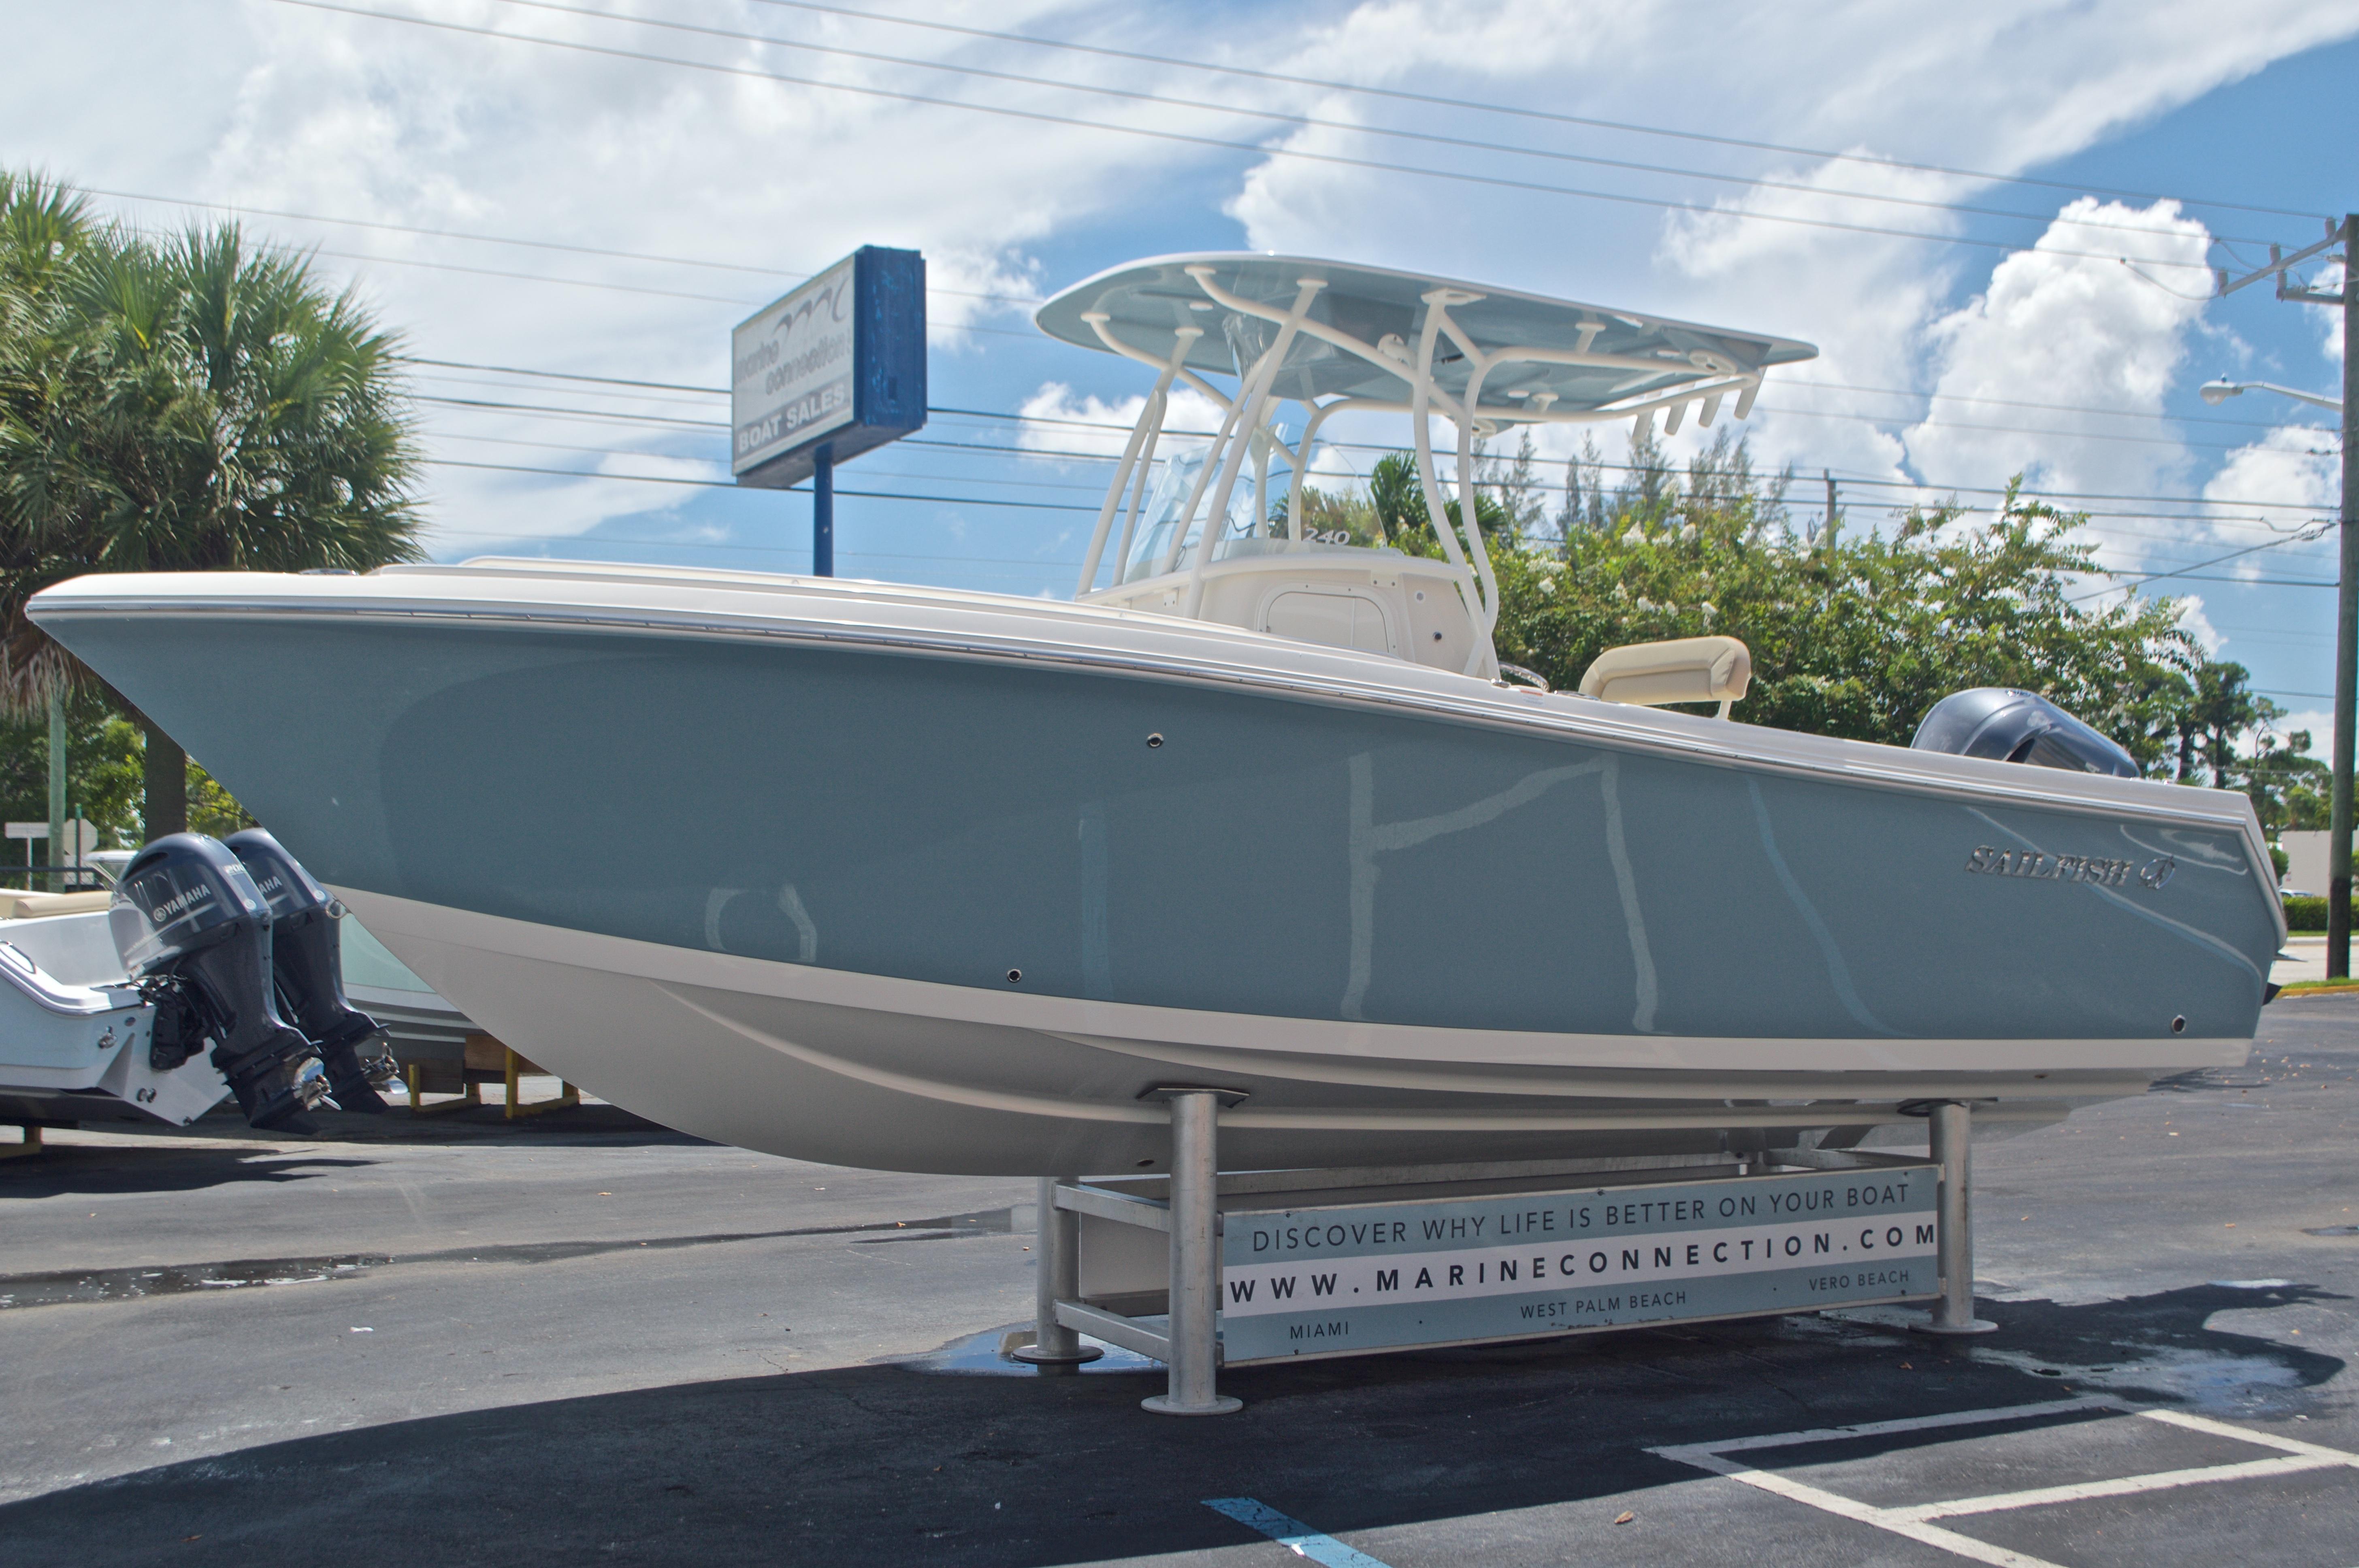 Thumbnail 3 for New 2017 Sailfish 240 CC Center Console boat for sale in Miami, FL